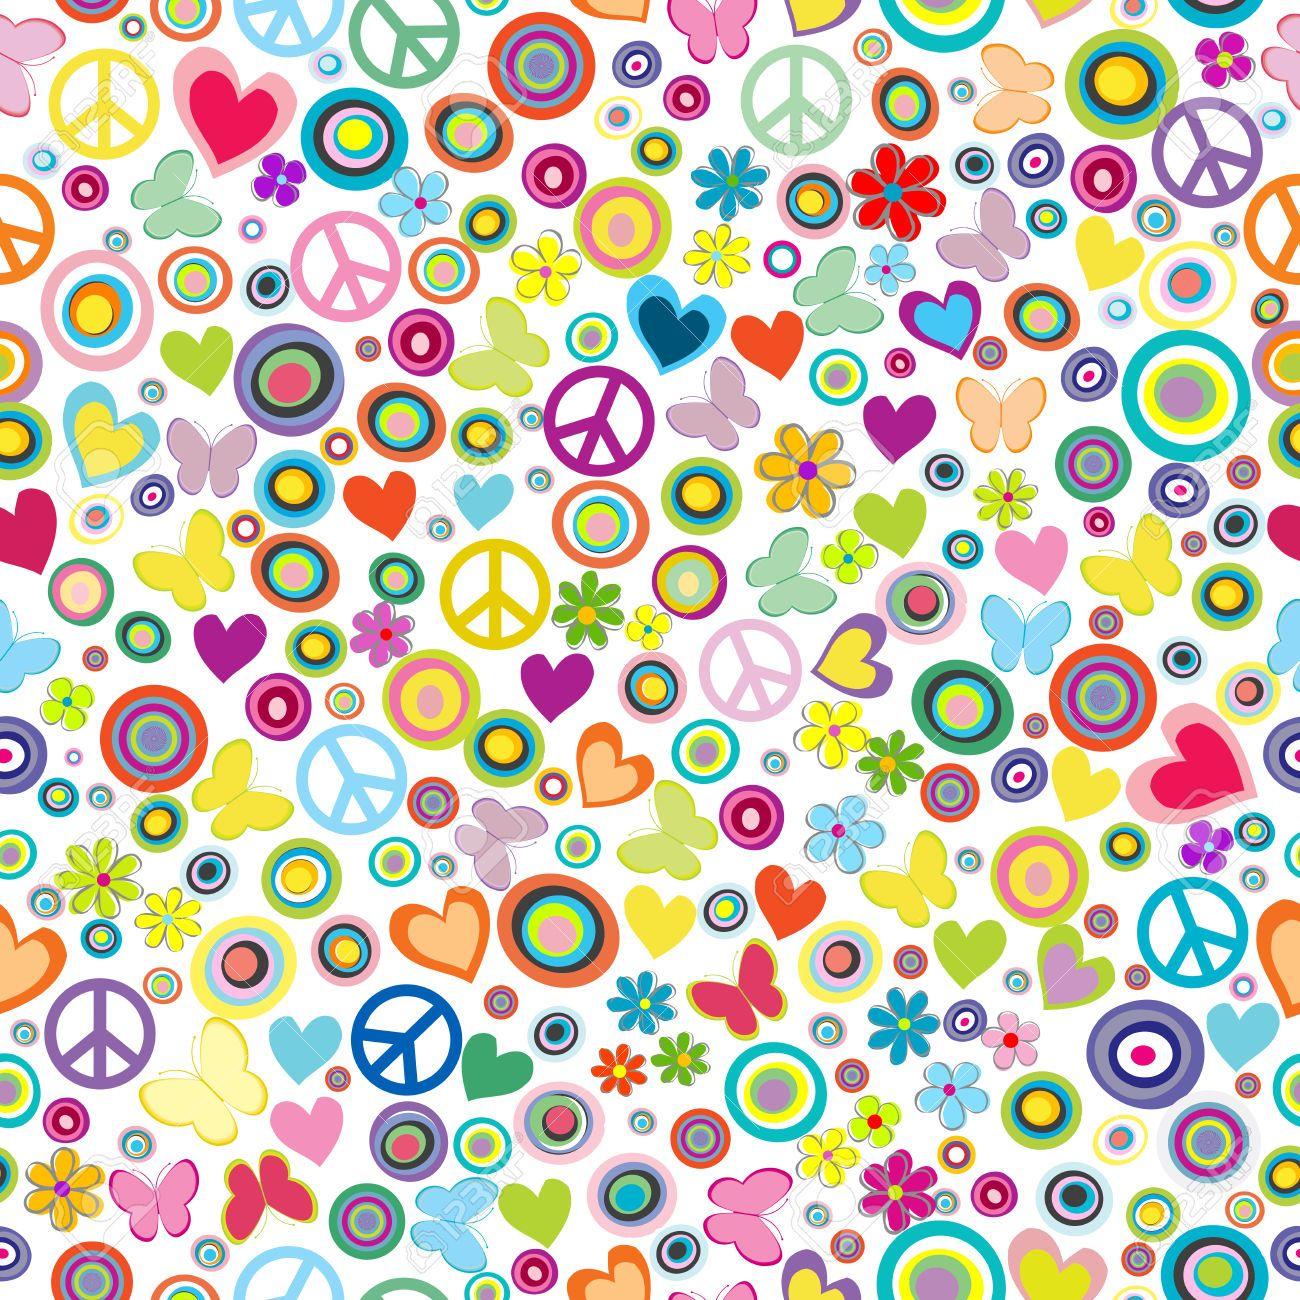 Love flower power daisy graffiti print cotton fabric 60s 70s retro - Flower Power Bloemen Google Zoeken